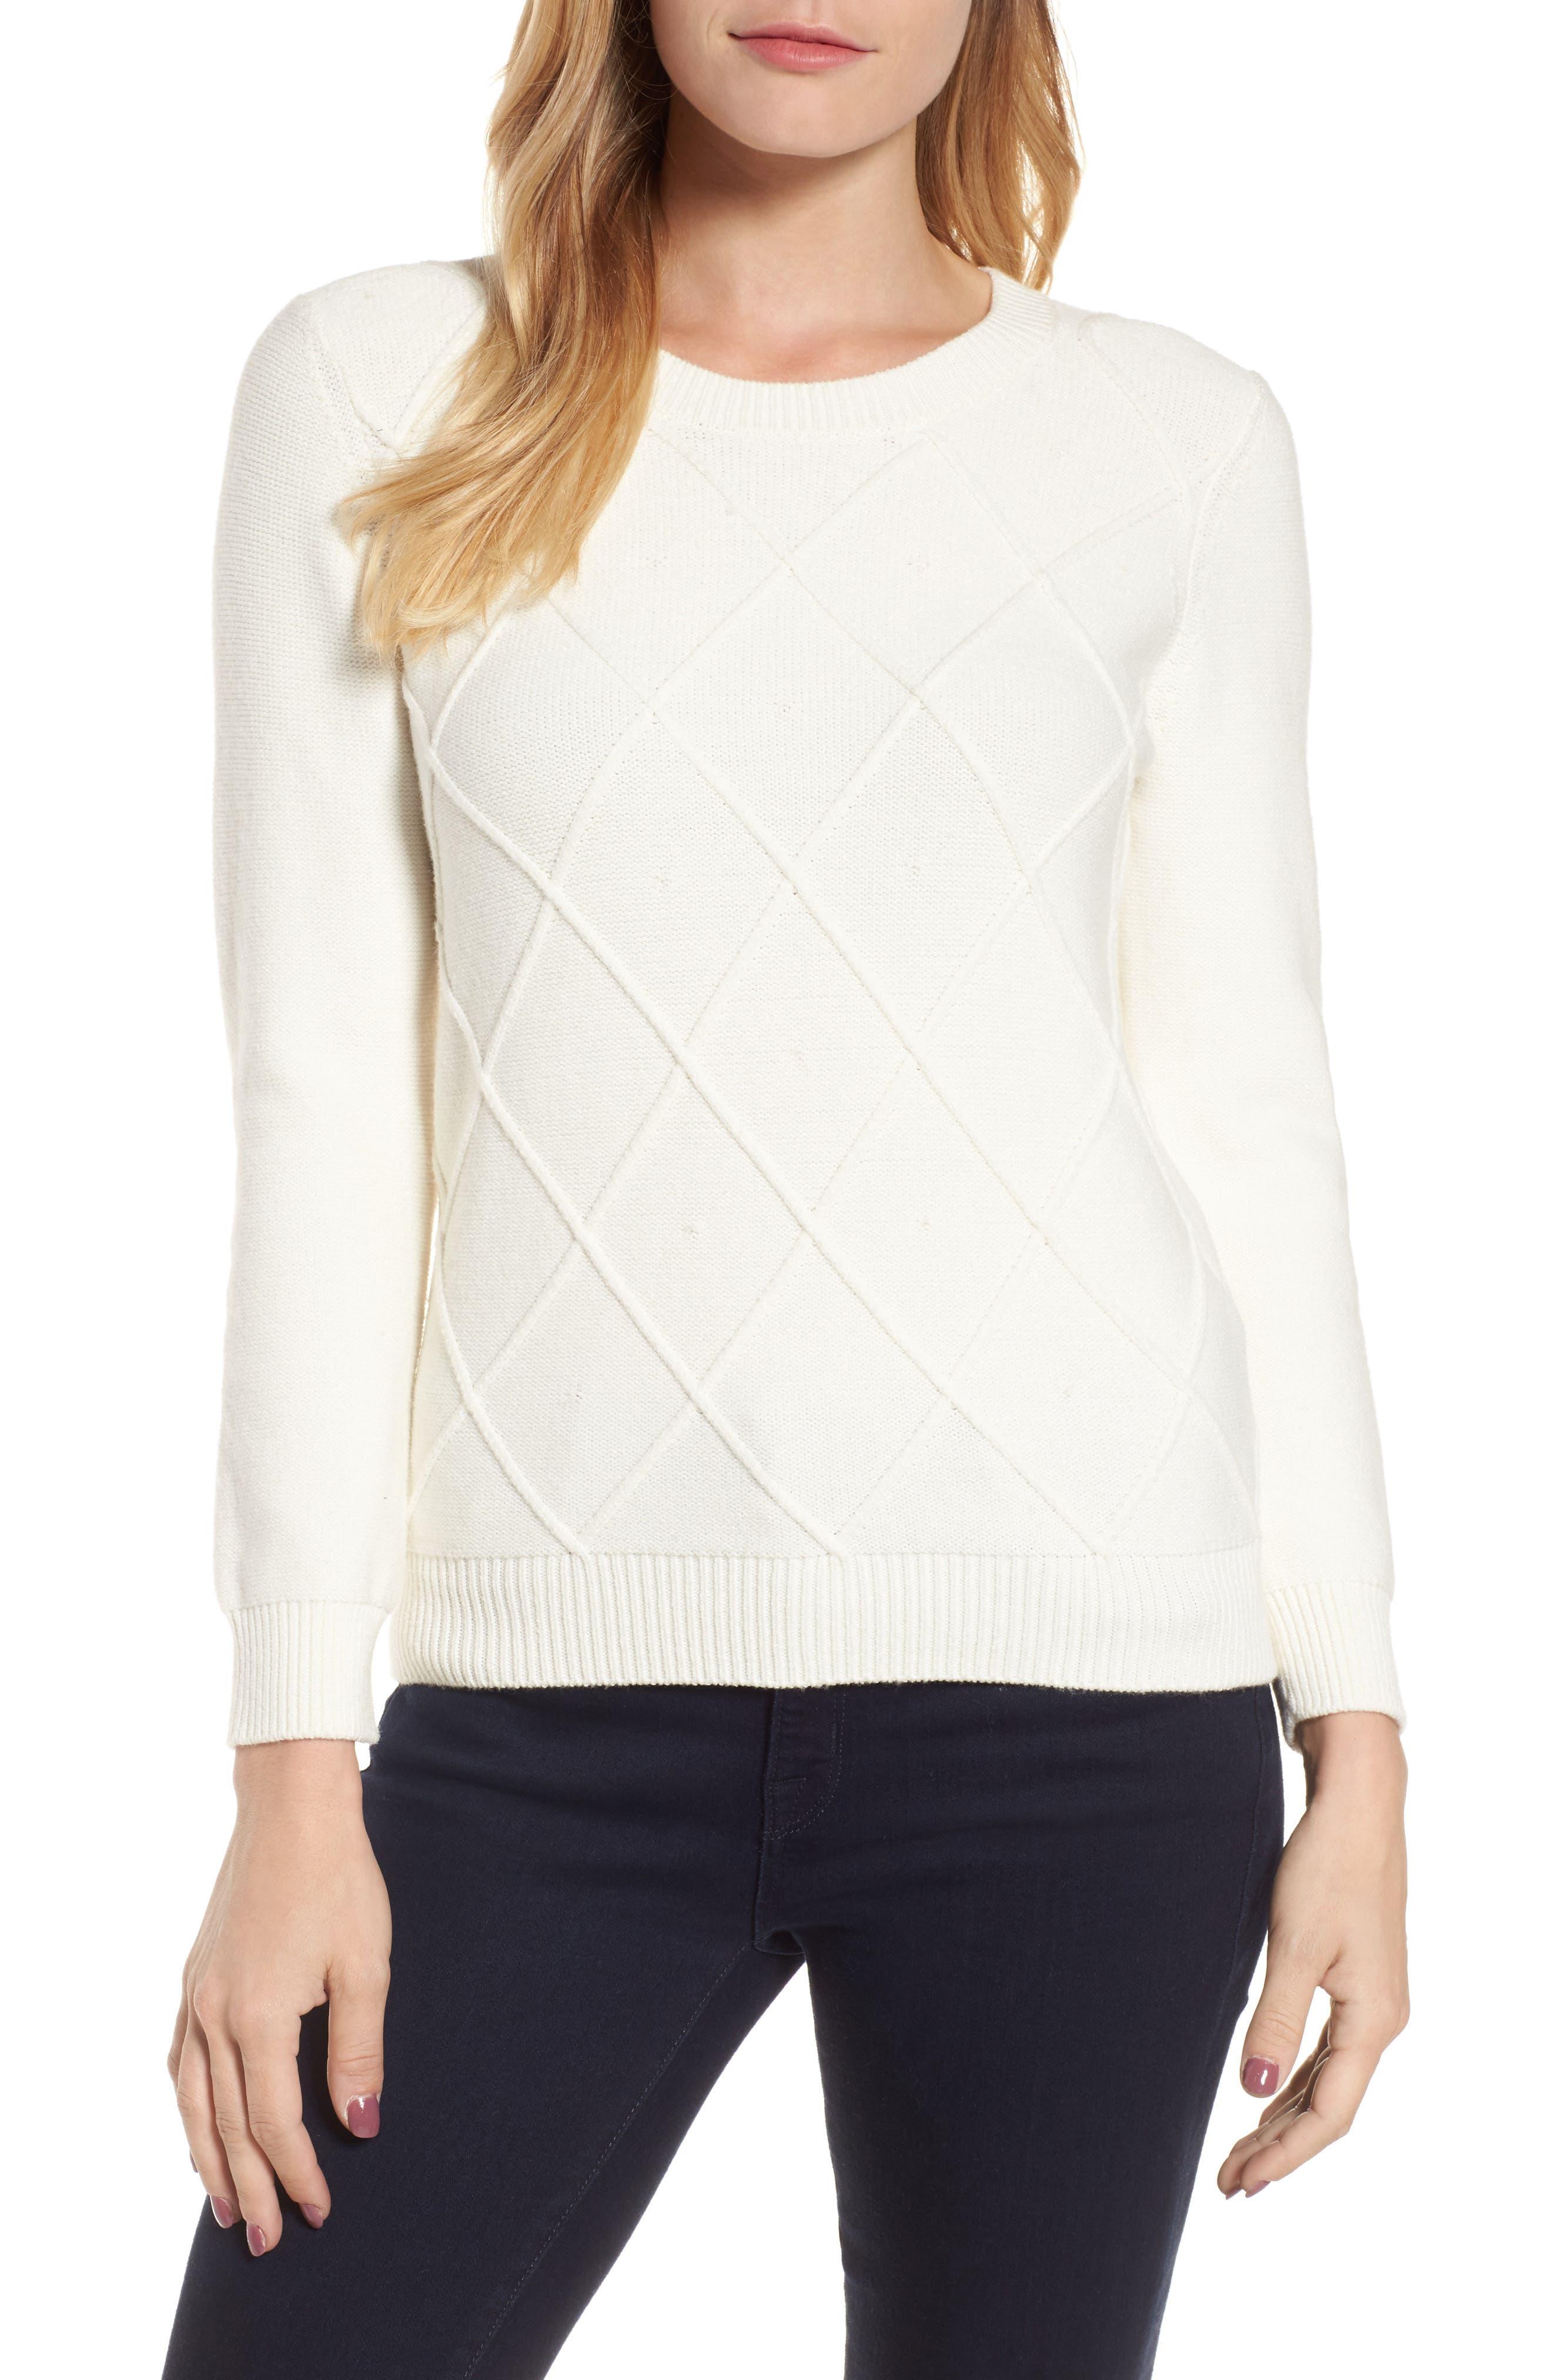 Alternate Image 1 Selected - Draper James Argyle Dot Sweater